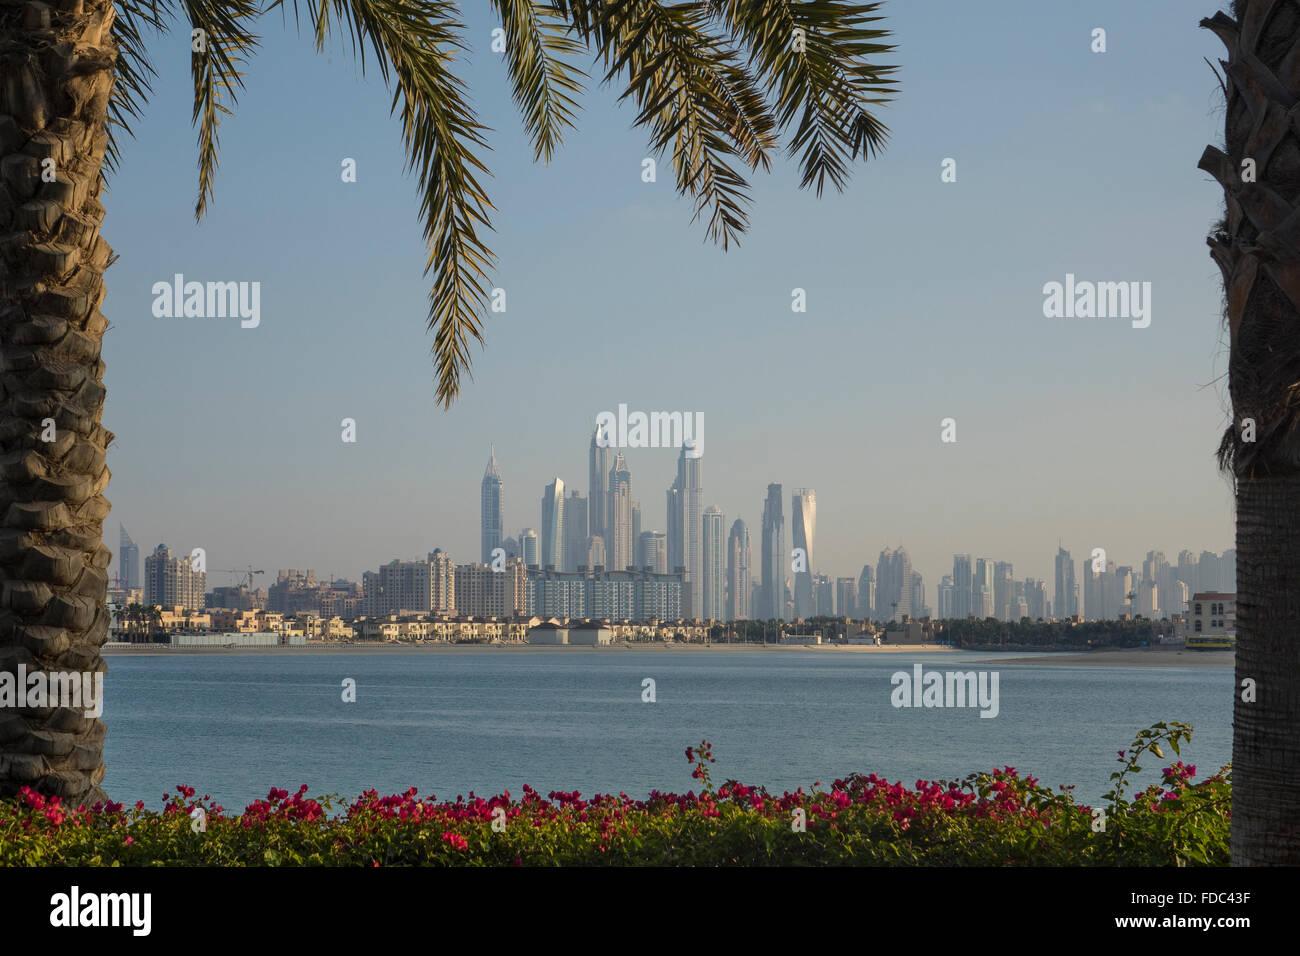 United Arab Emirates, Dubai, Jumeirah skyline from the Palm - Stock Image